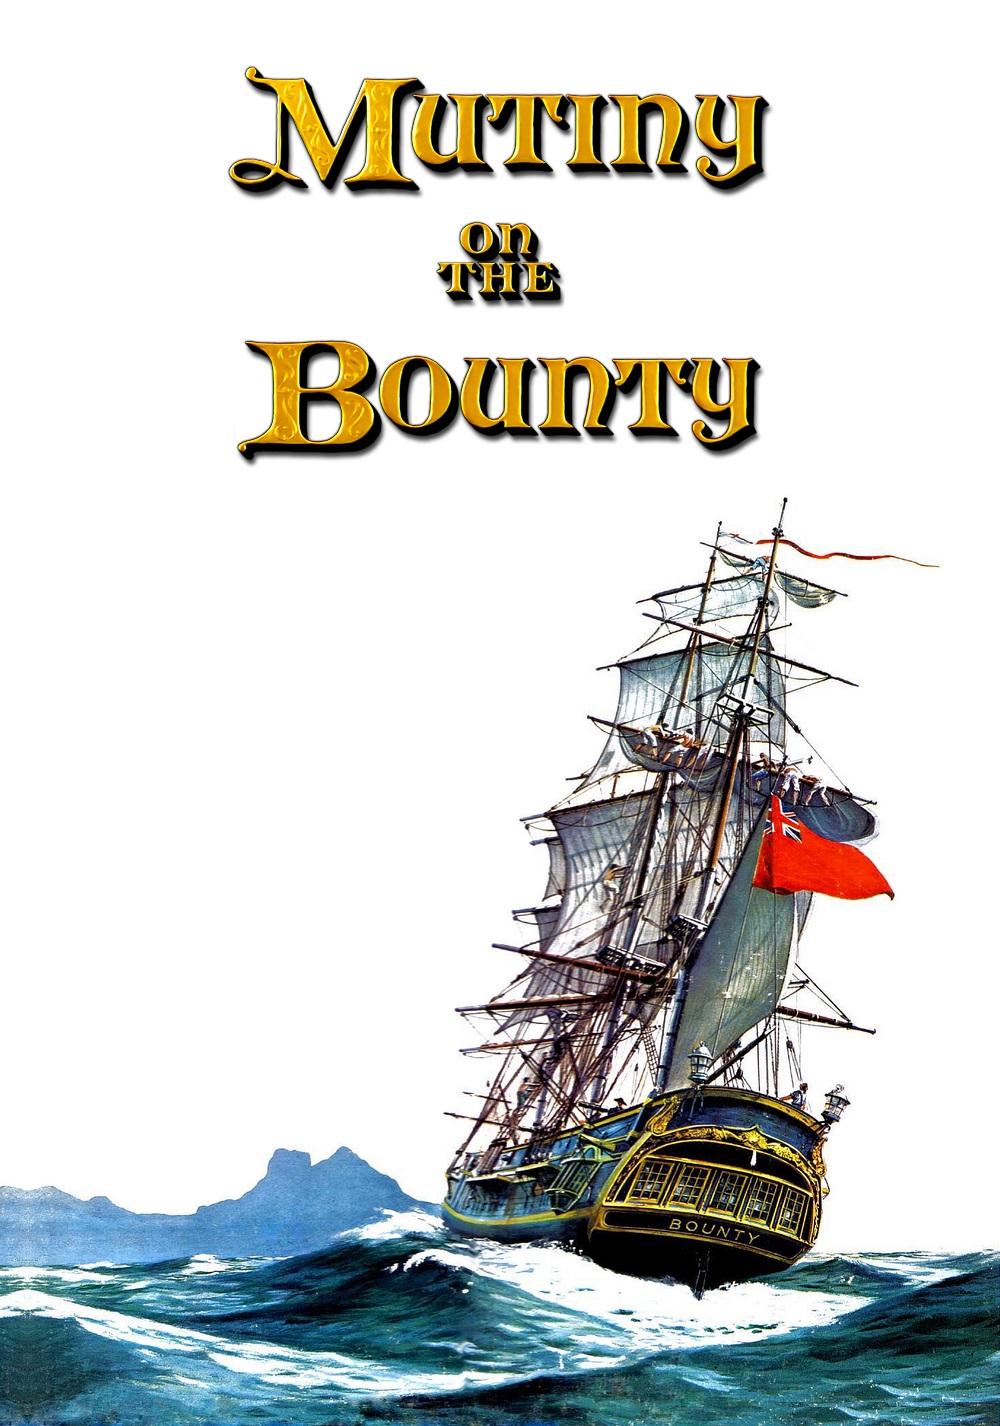 Mutiny the movie